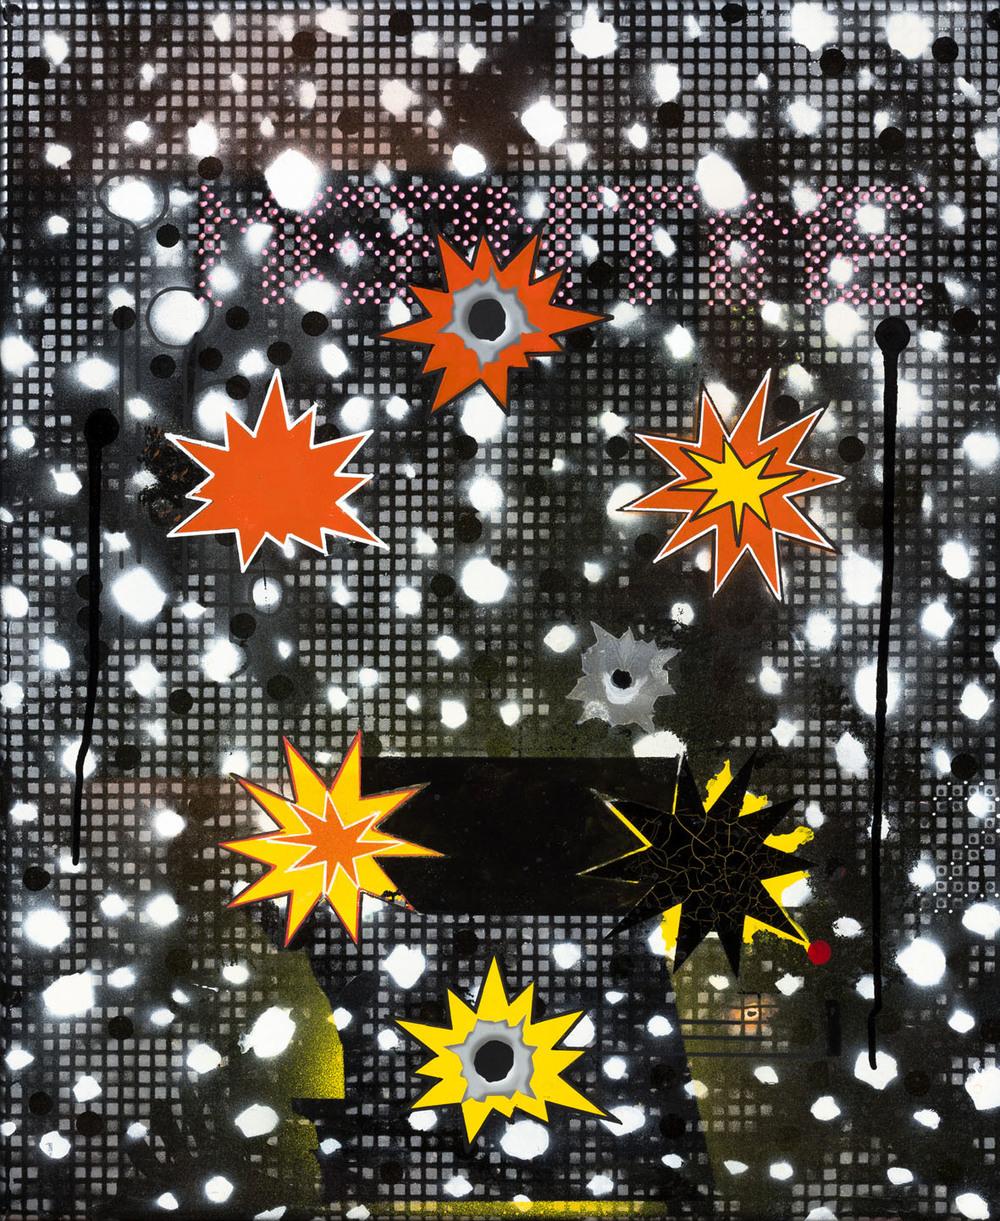 Dark star, 2015